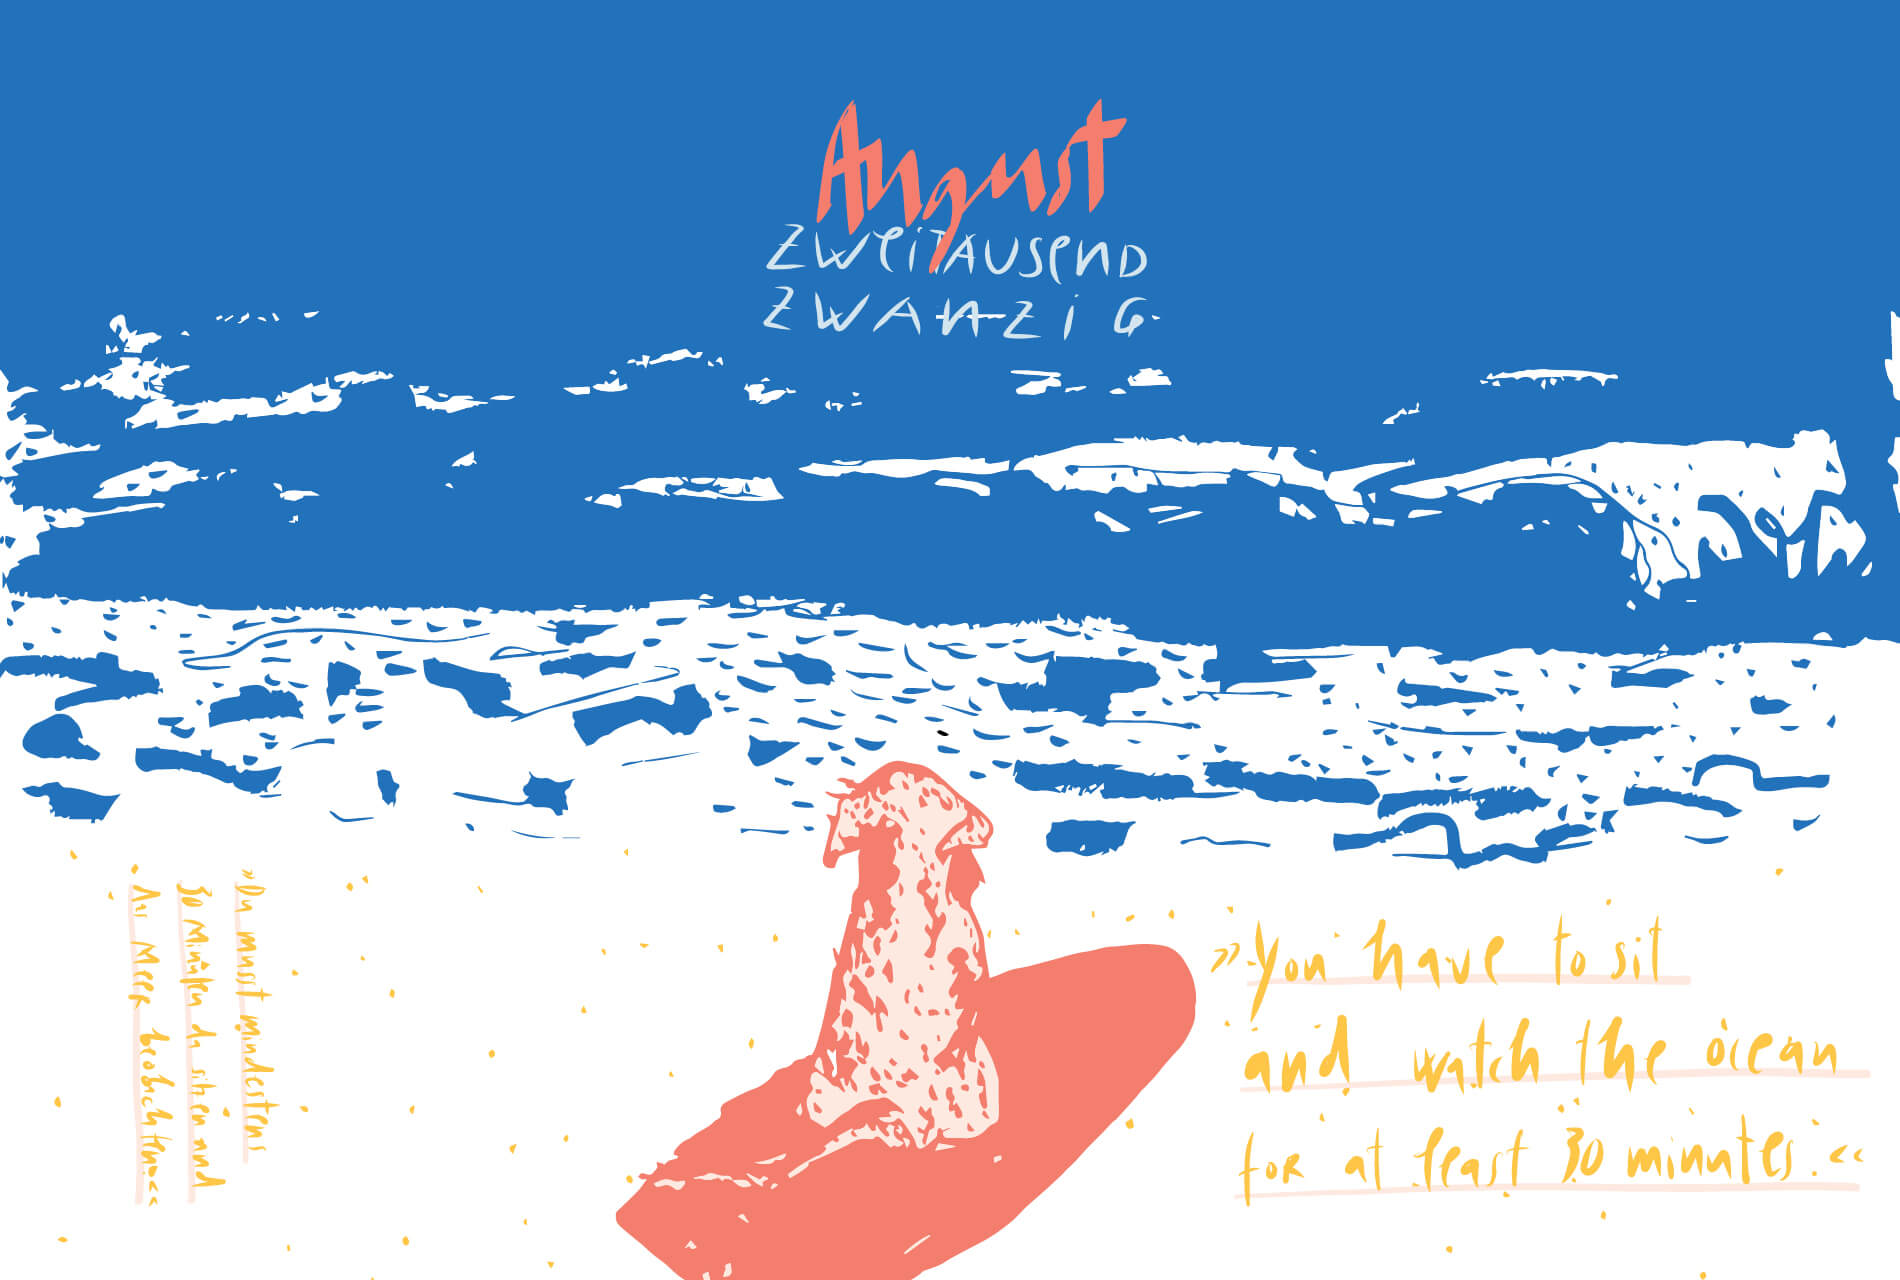 Matrosenhunde Illustration Zeichnung Illustratorin Text Prosa Monatskalender August, You have to watsch the ocean at least for half an hour.